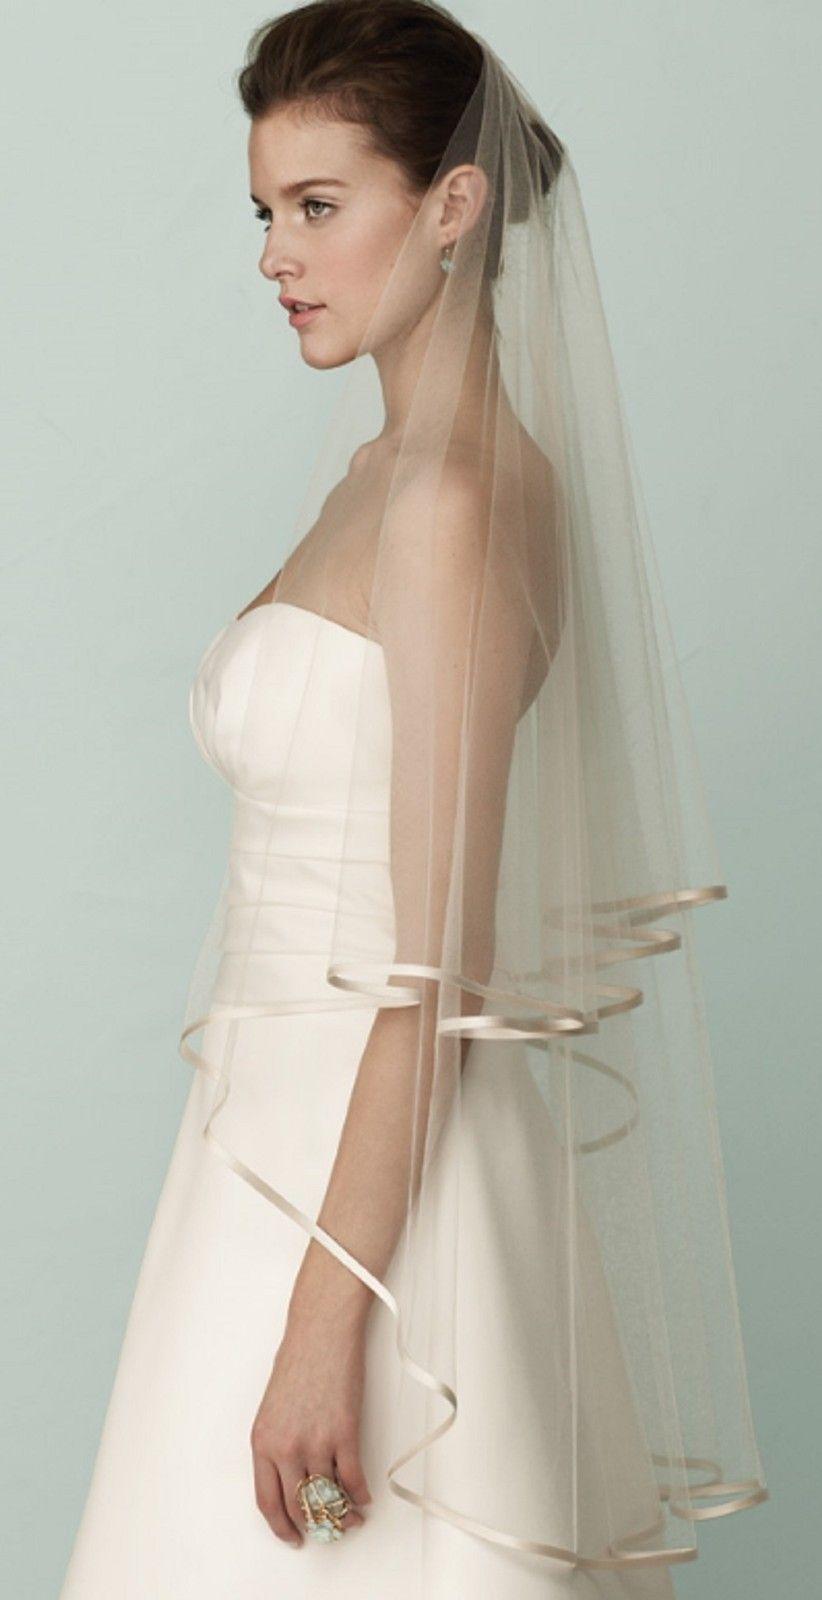 Hot 2T edged Ivory Wedding veil Simple Soft Tulle Net Bridal veils Best Price RL9431